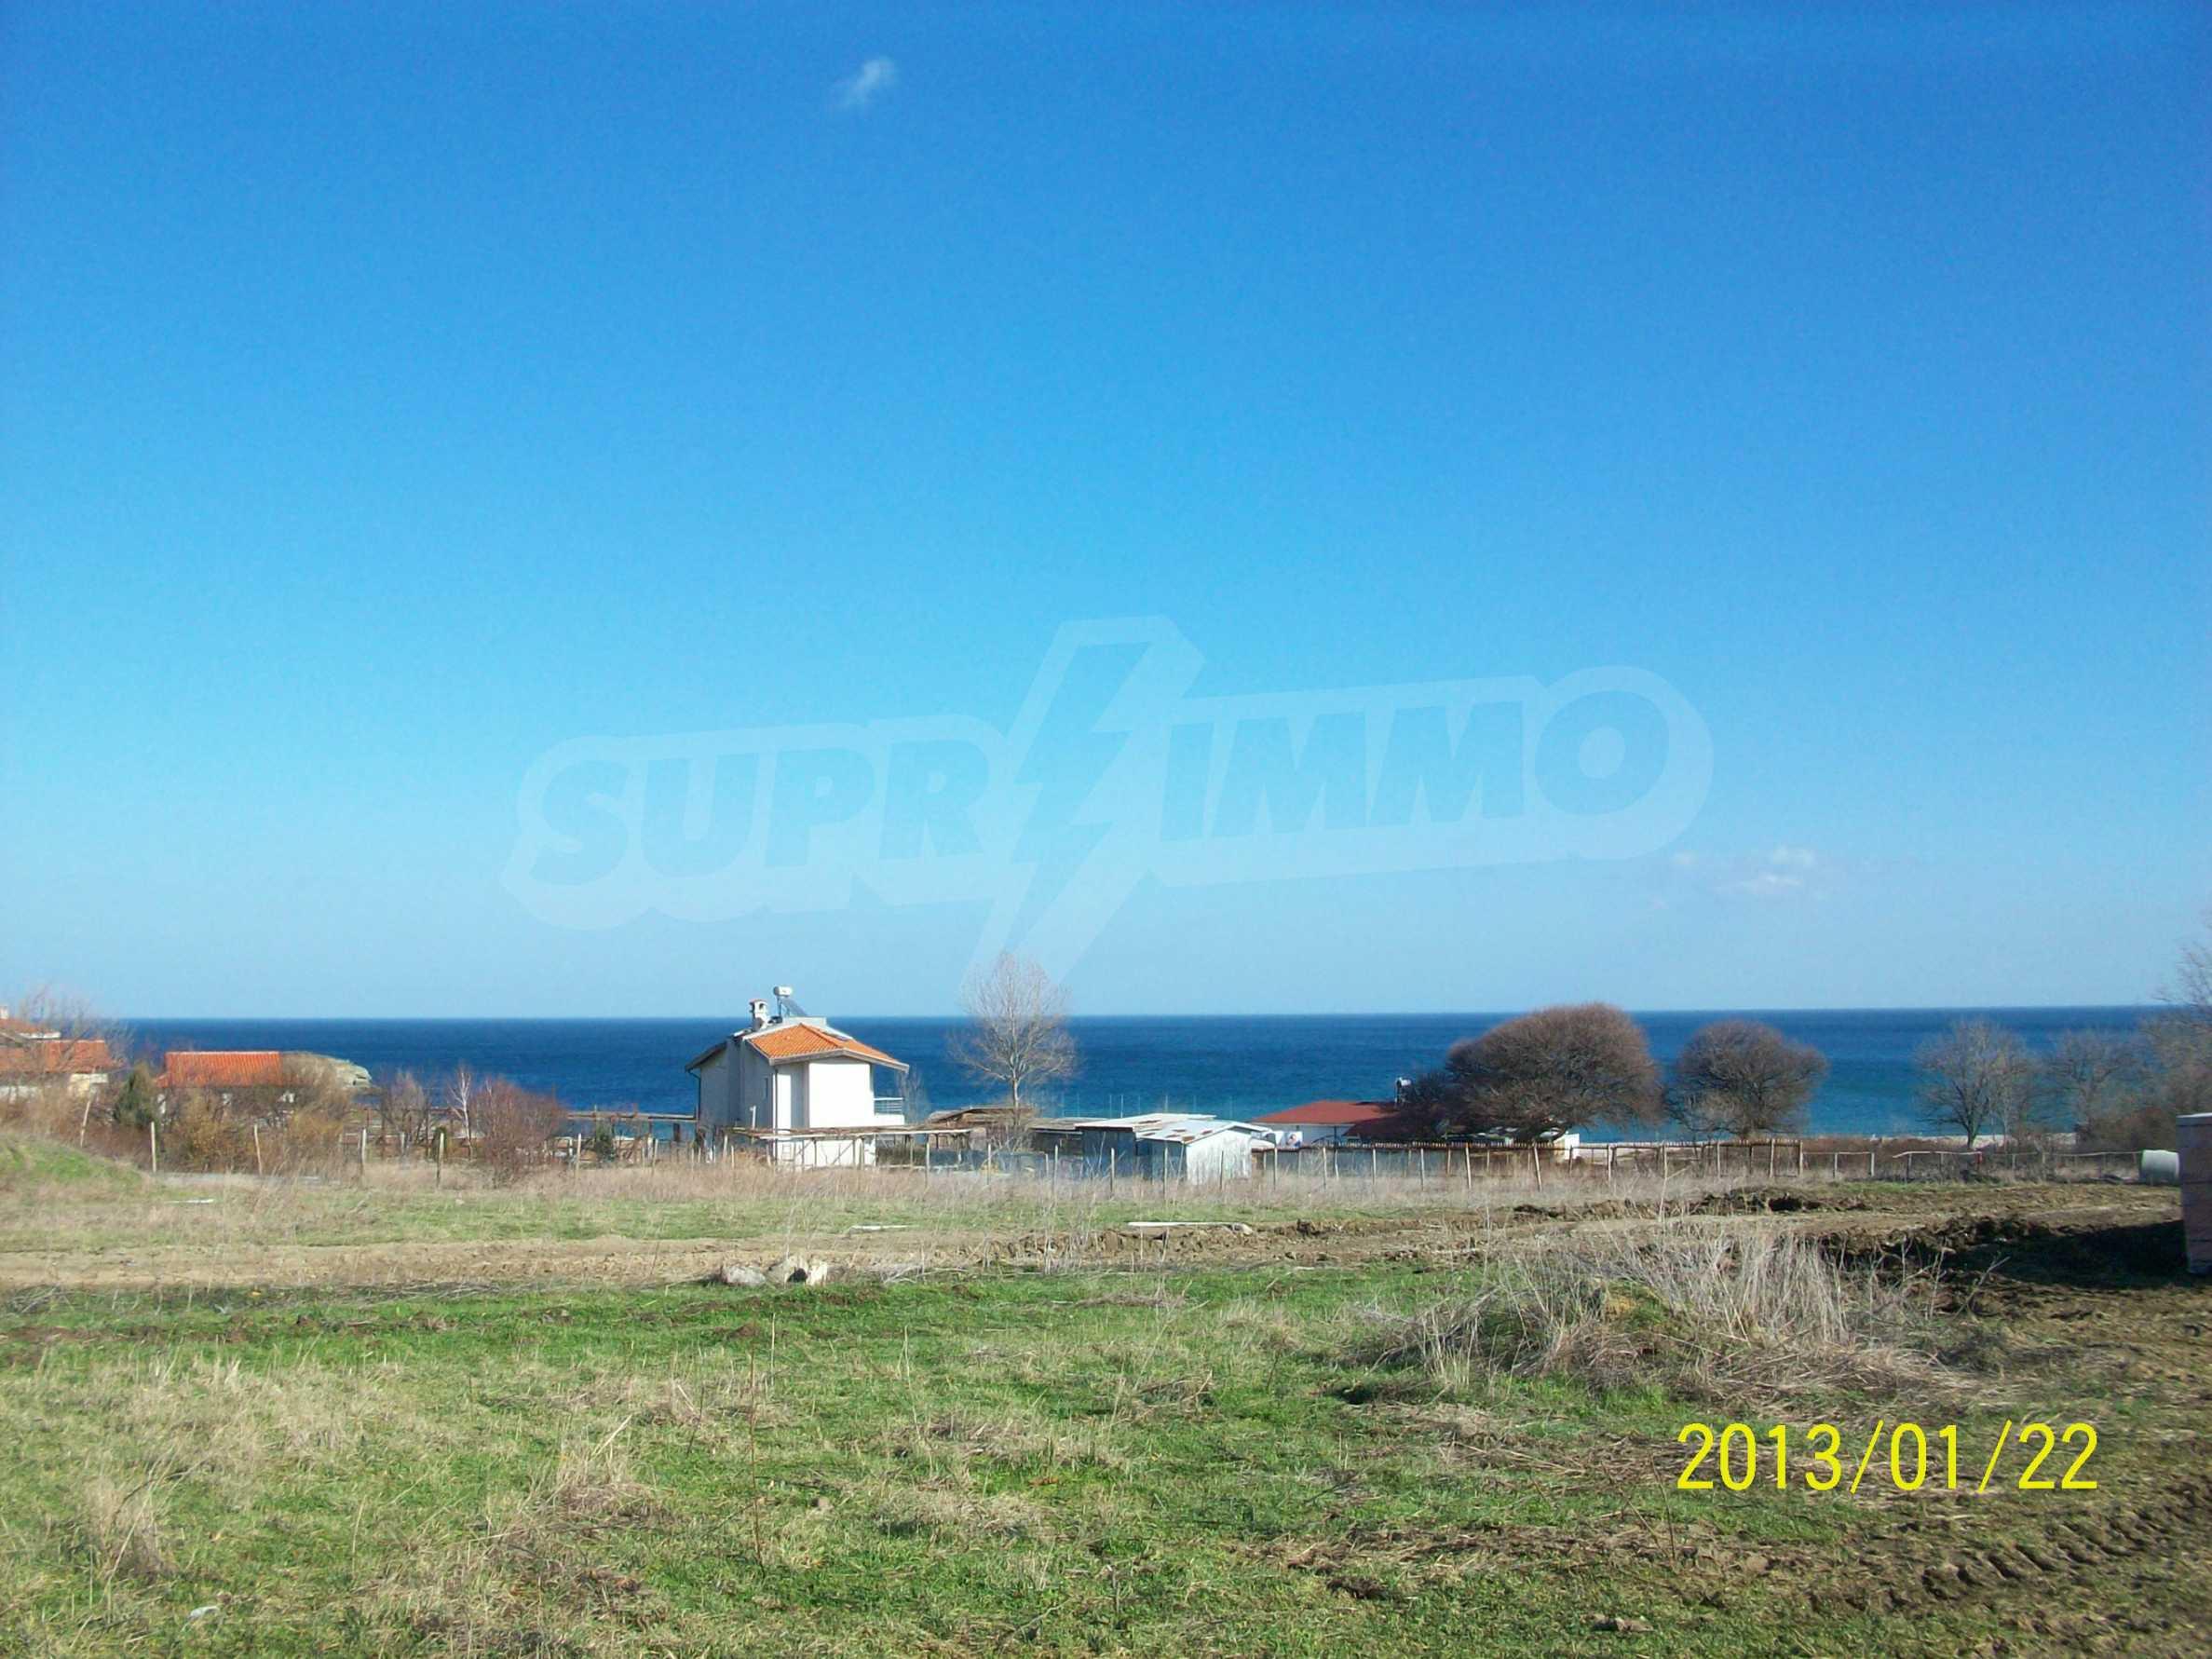 Land for sale in resort village of Lozenets 2